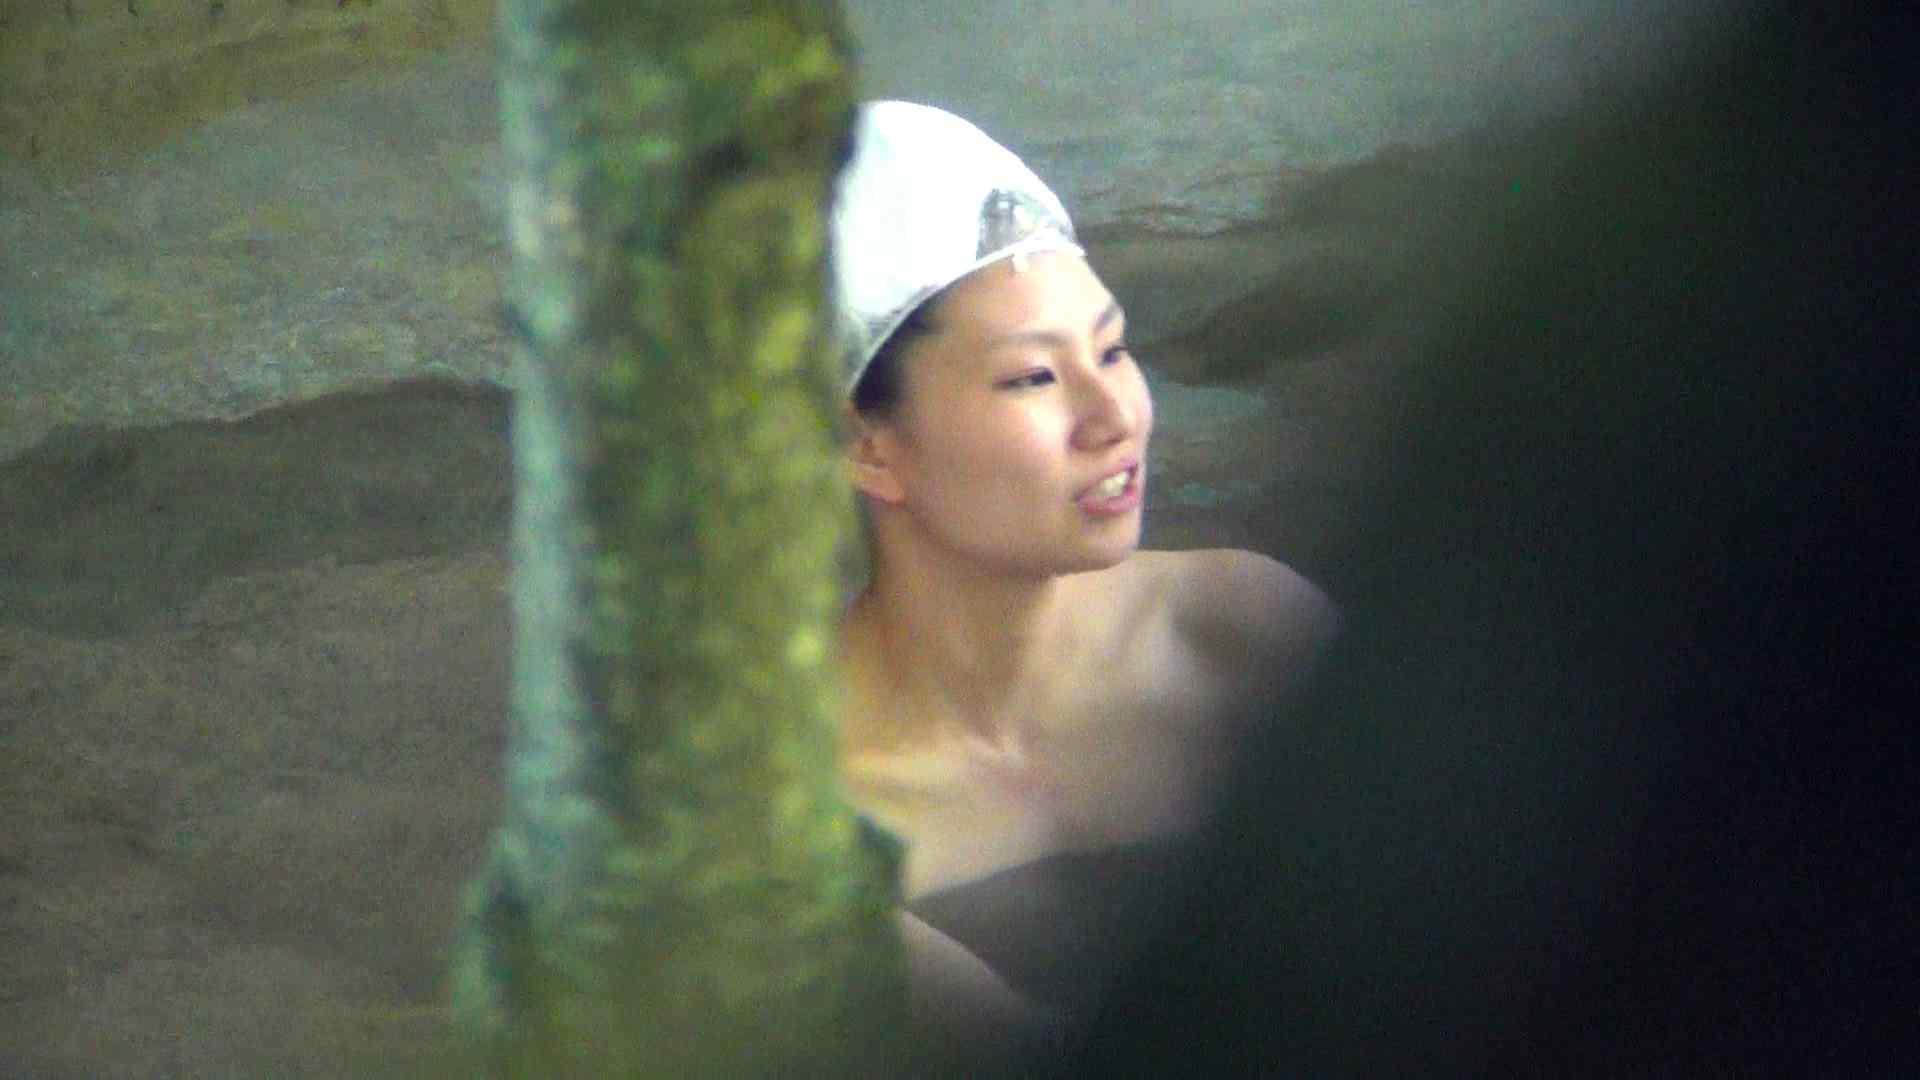 Vol.43 ヘアキャップをしても美しい中性的美女simai 美女 AV動画キャプチャ 110画像 40